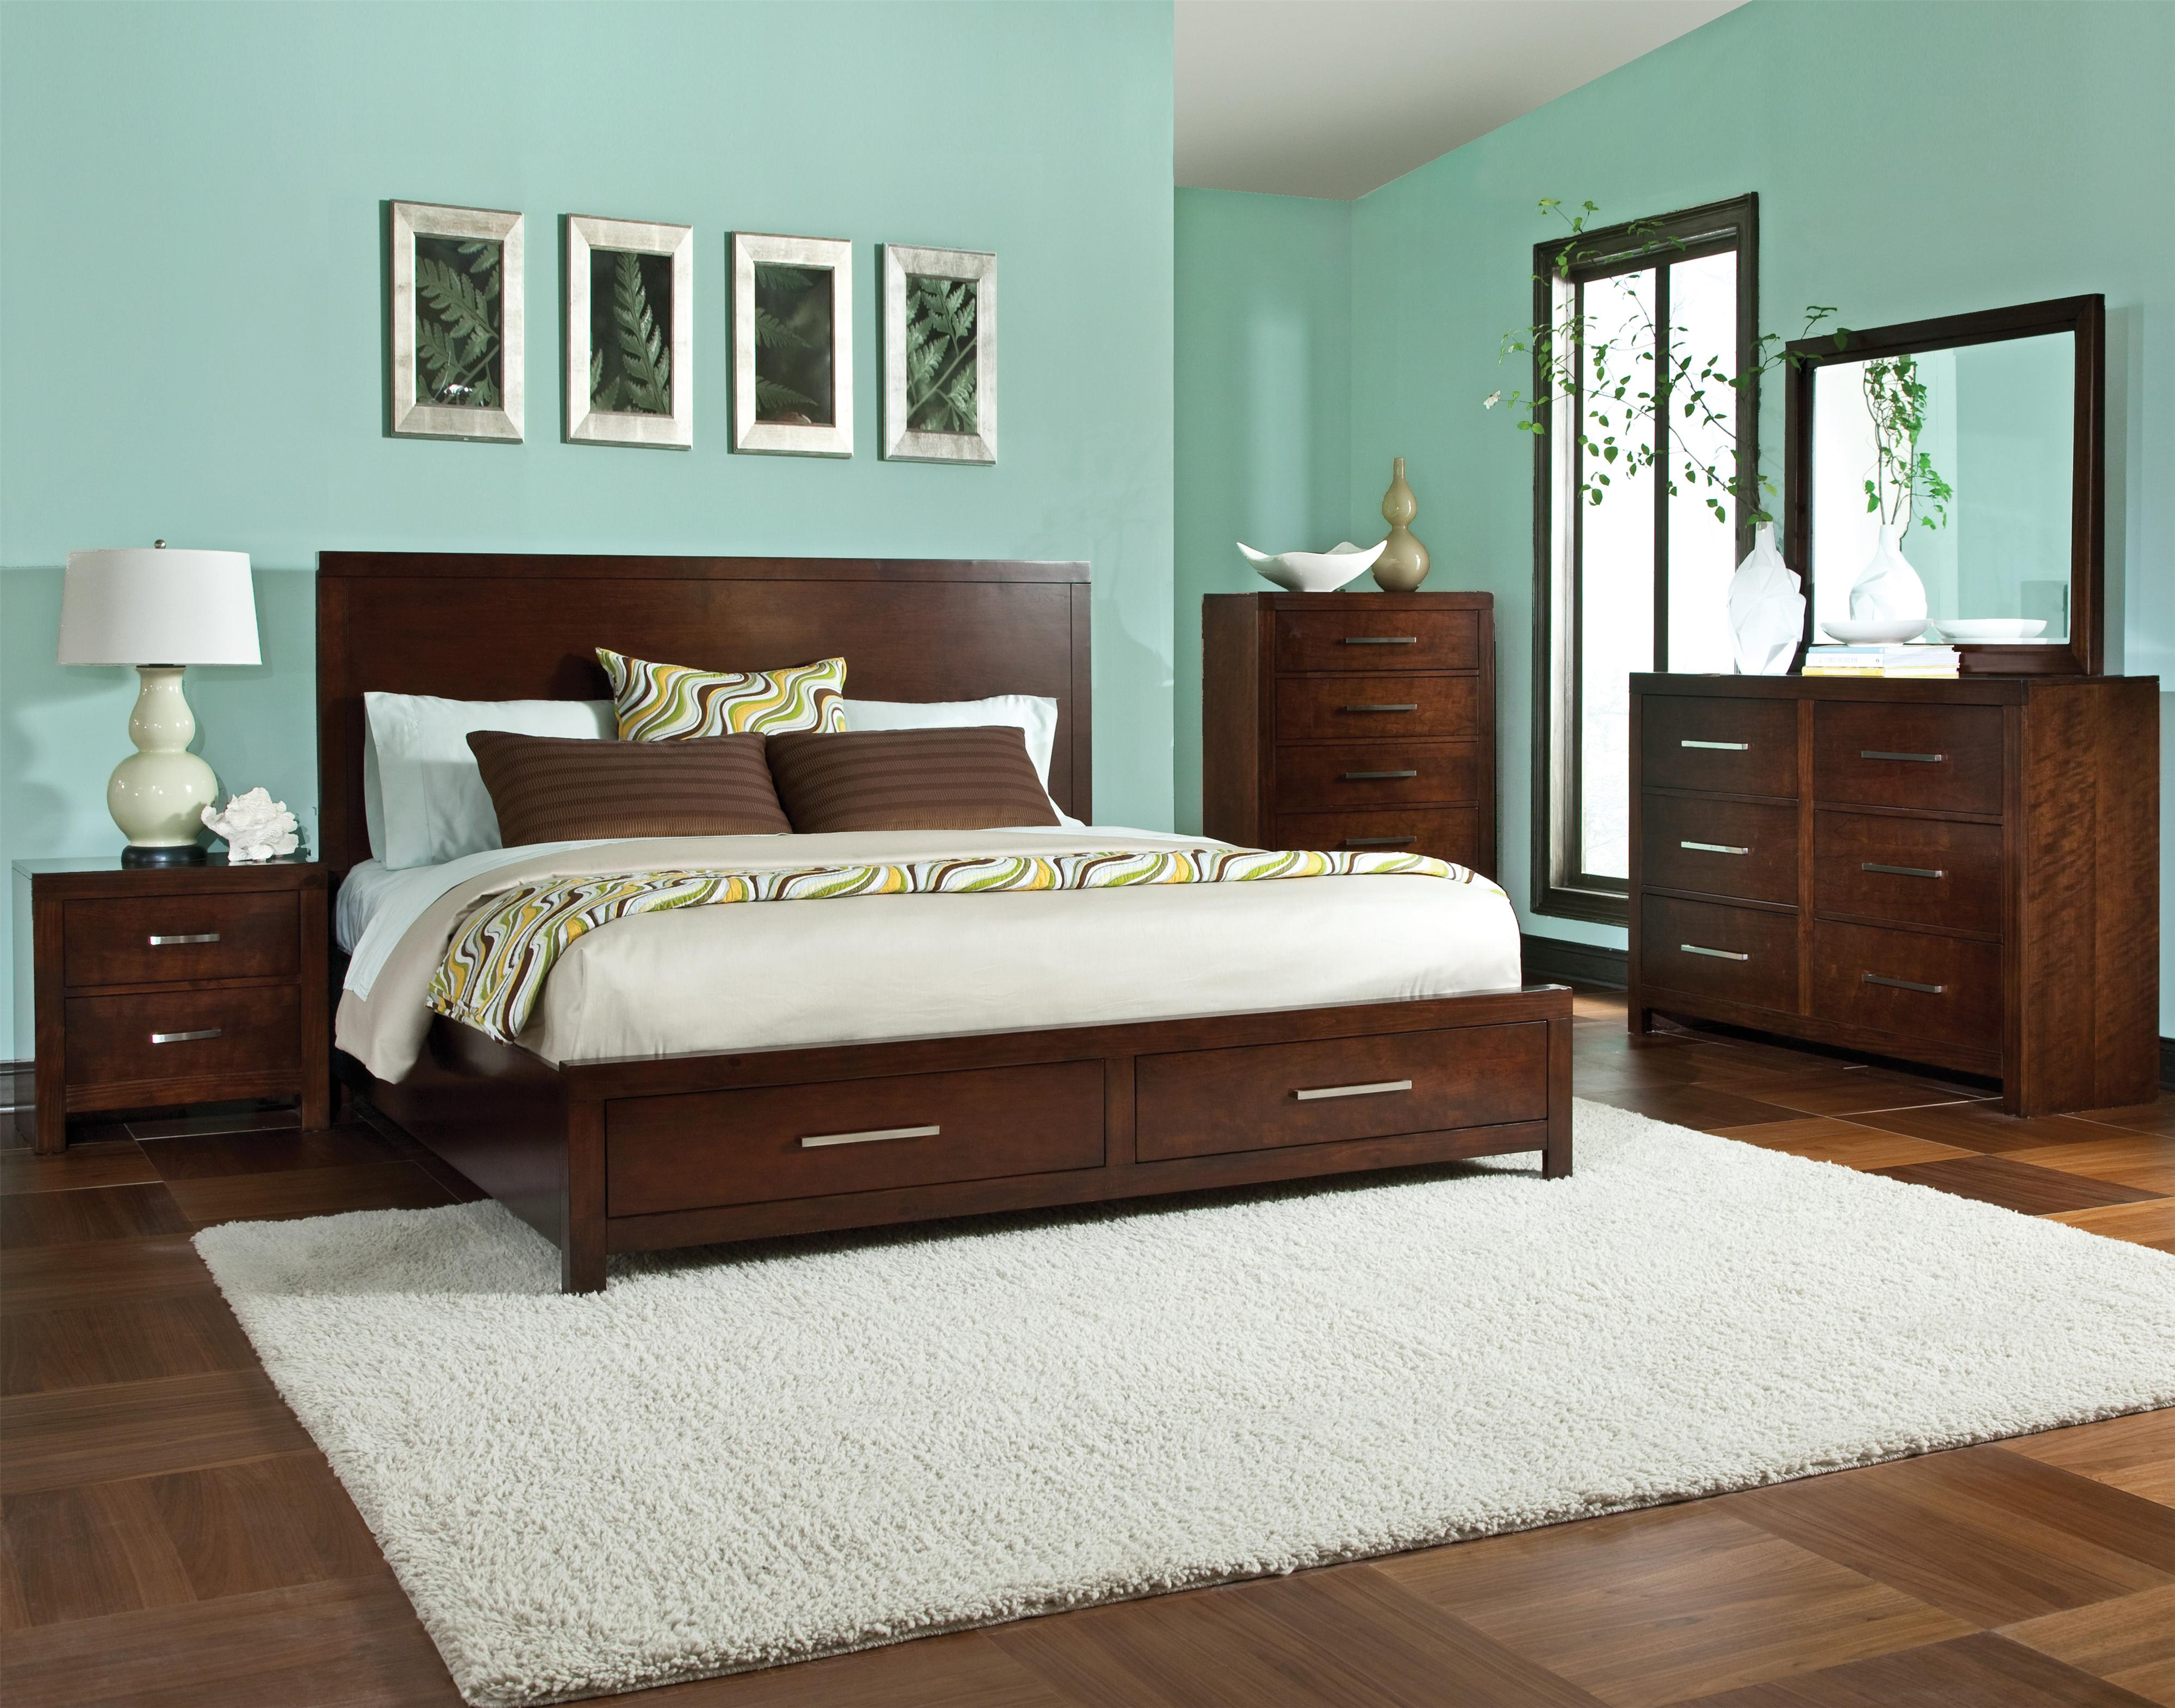 Standard Furniture Metro King Bedroom Group - Item Number: 87950 K Bedroom Group 1